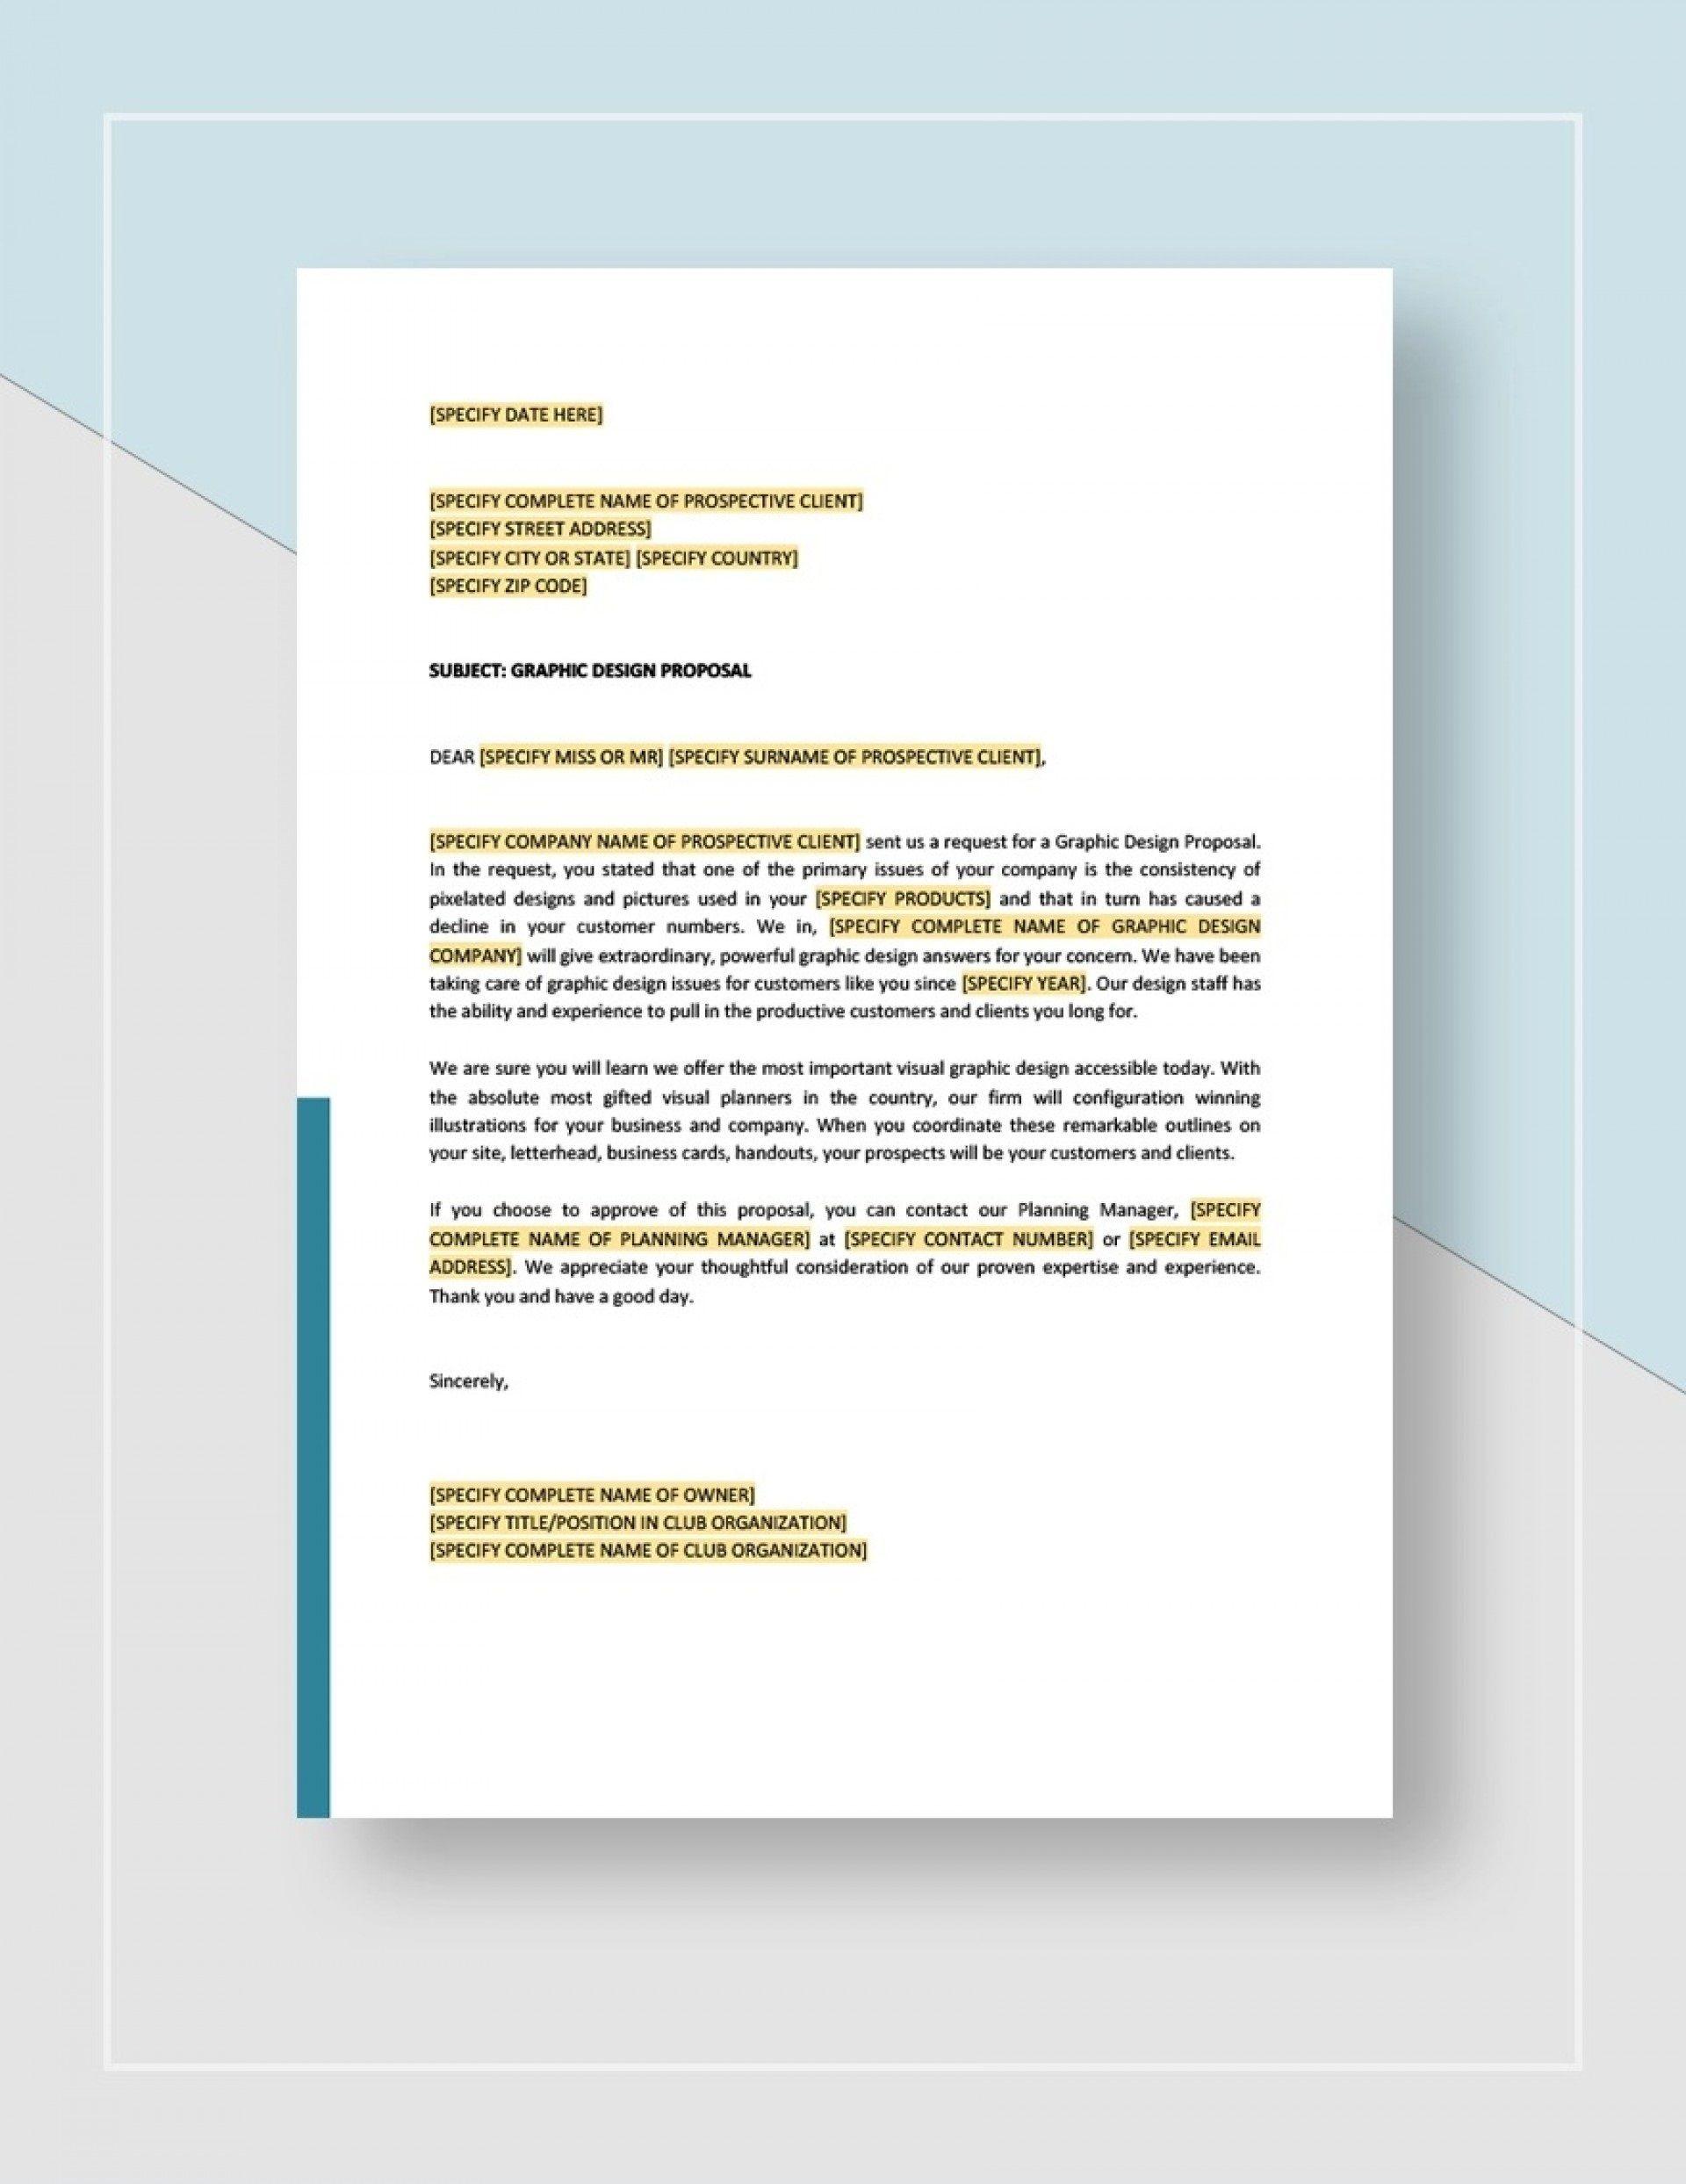 009 Singular Graphic Design Proposal Template Free Example  Freelance Pdf Indesign1920